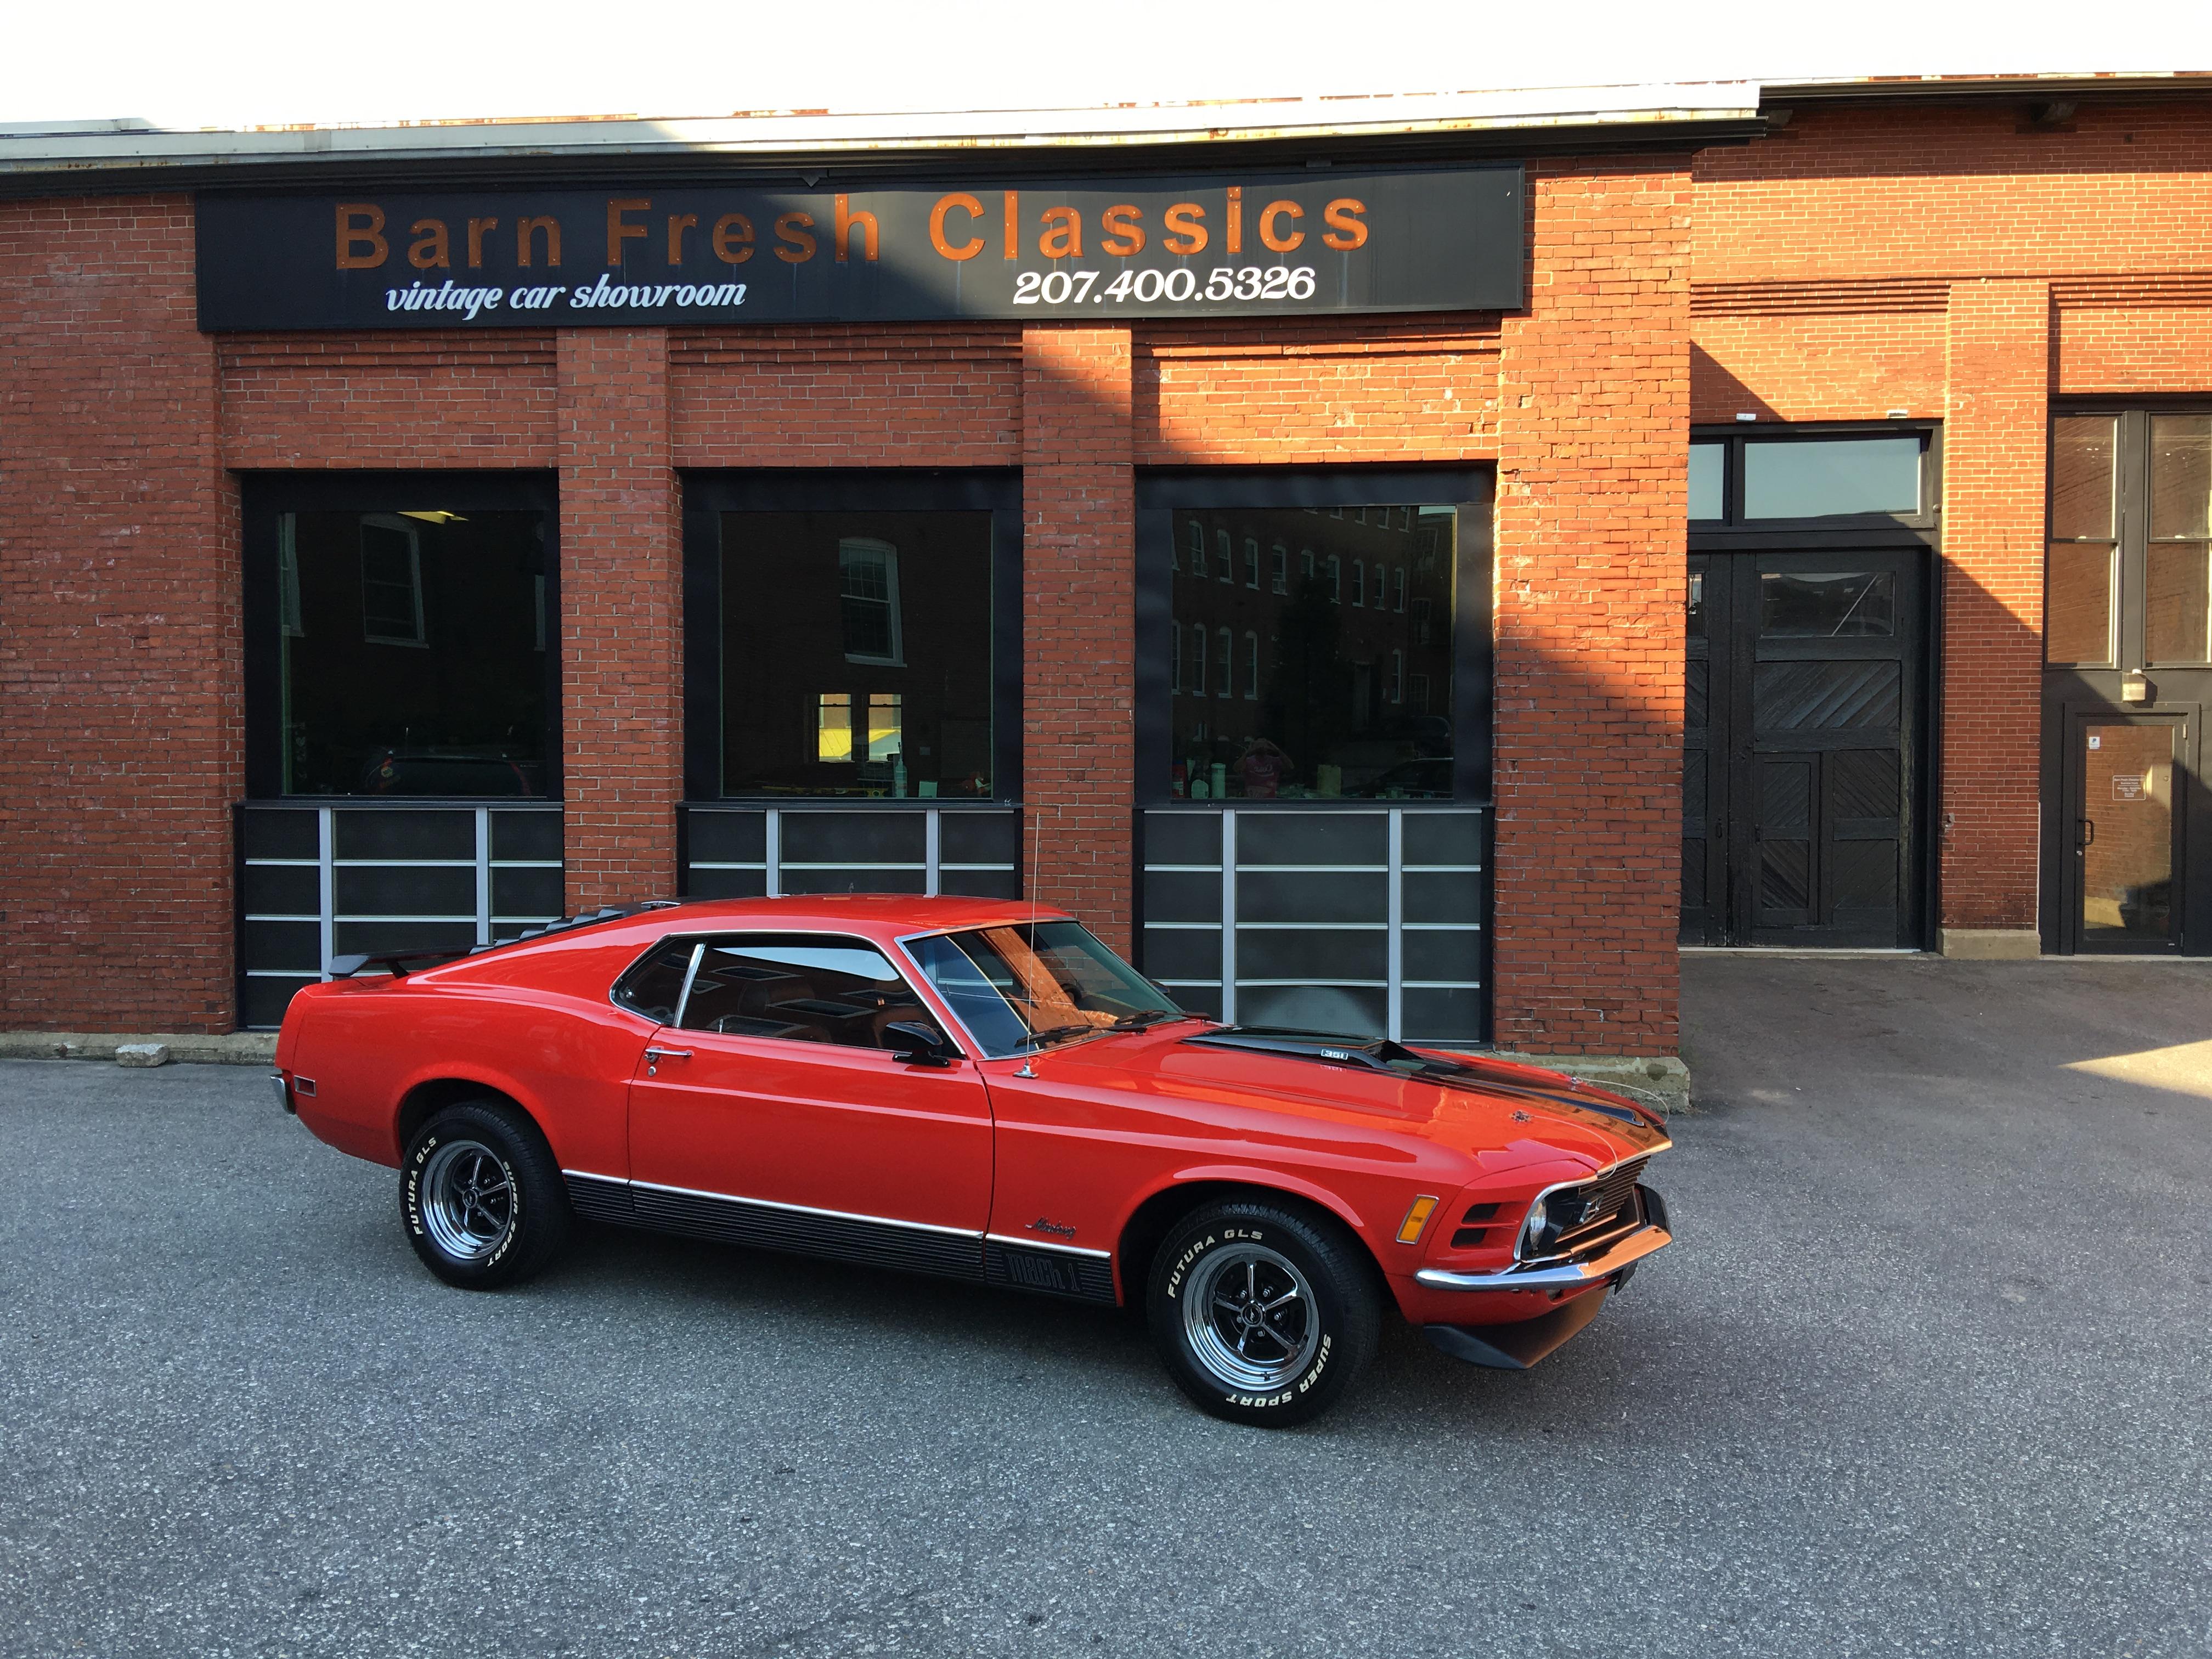 1970 Ford Mustang Mach 1 Tribute Barn Fresh Classics LLC